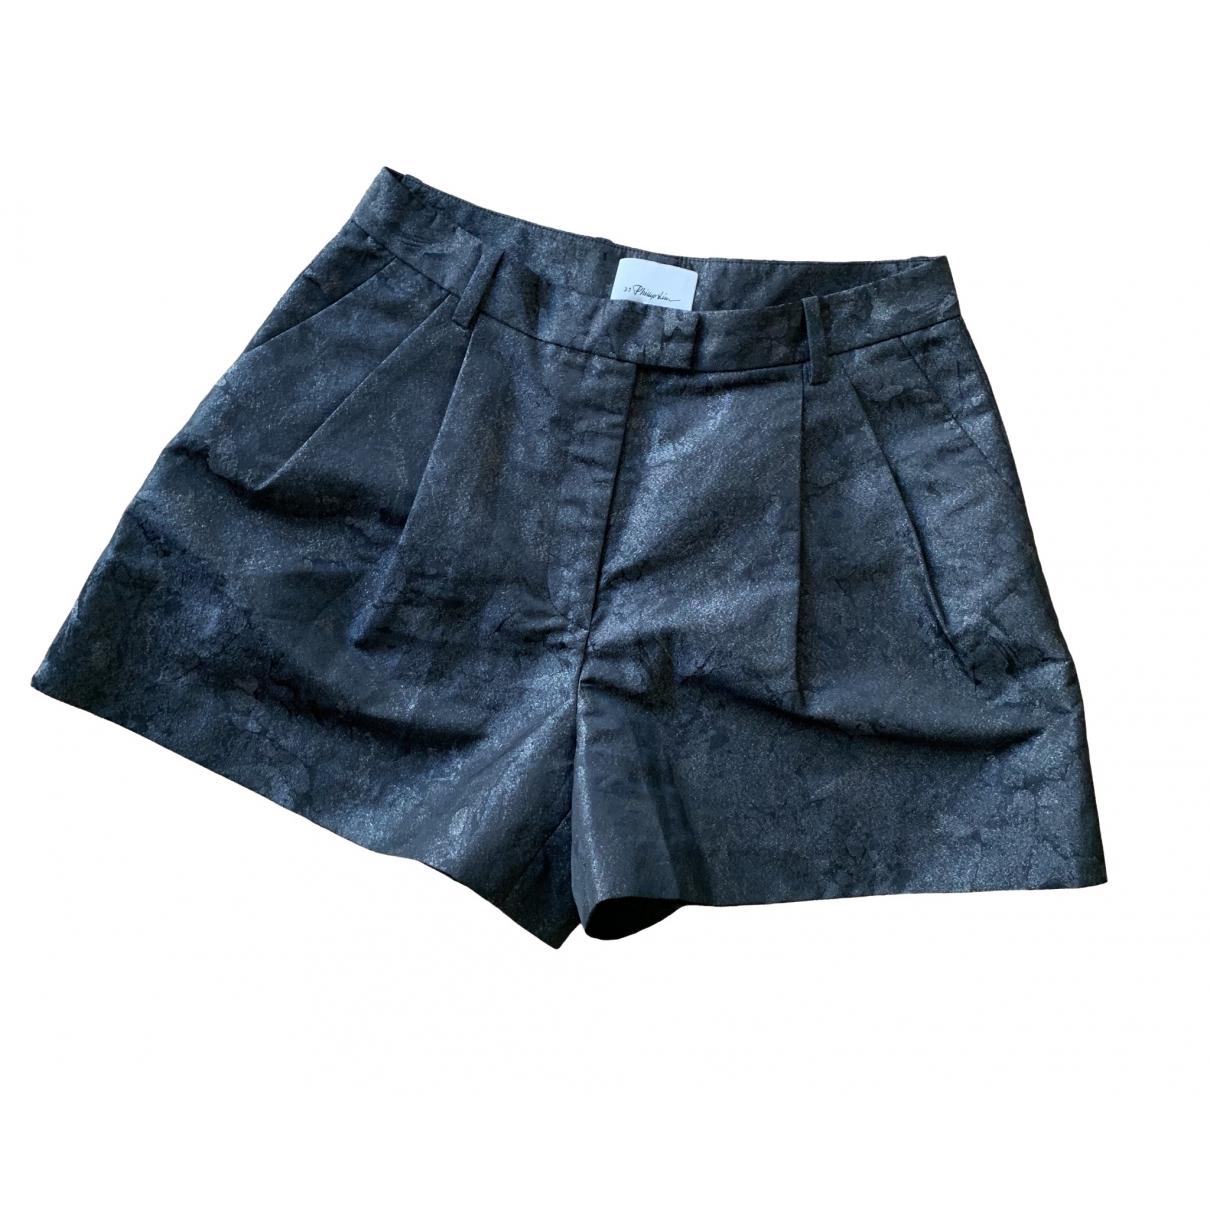 3.1 Phillip Lim \N Anthracite Shorts for Women M International